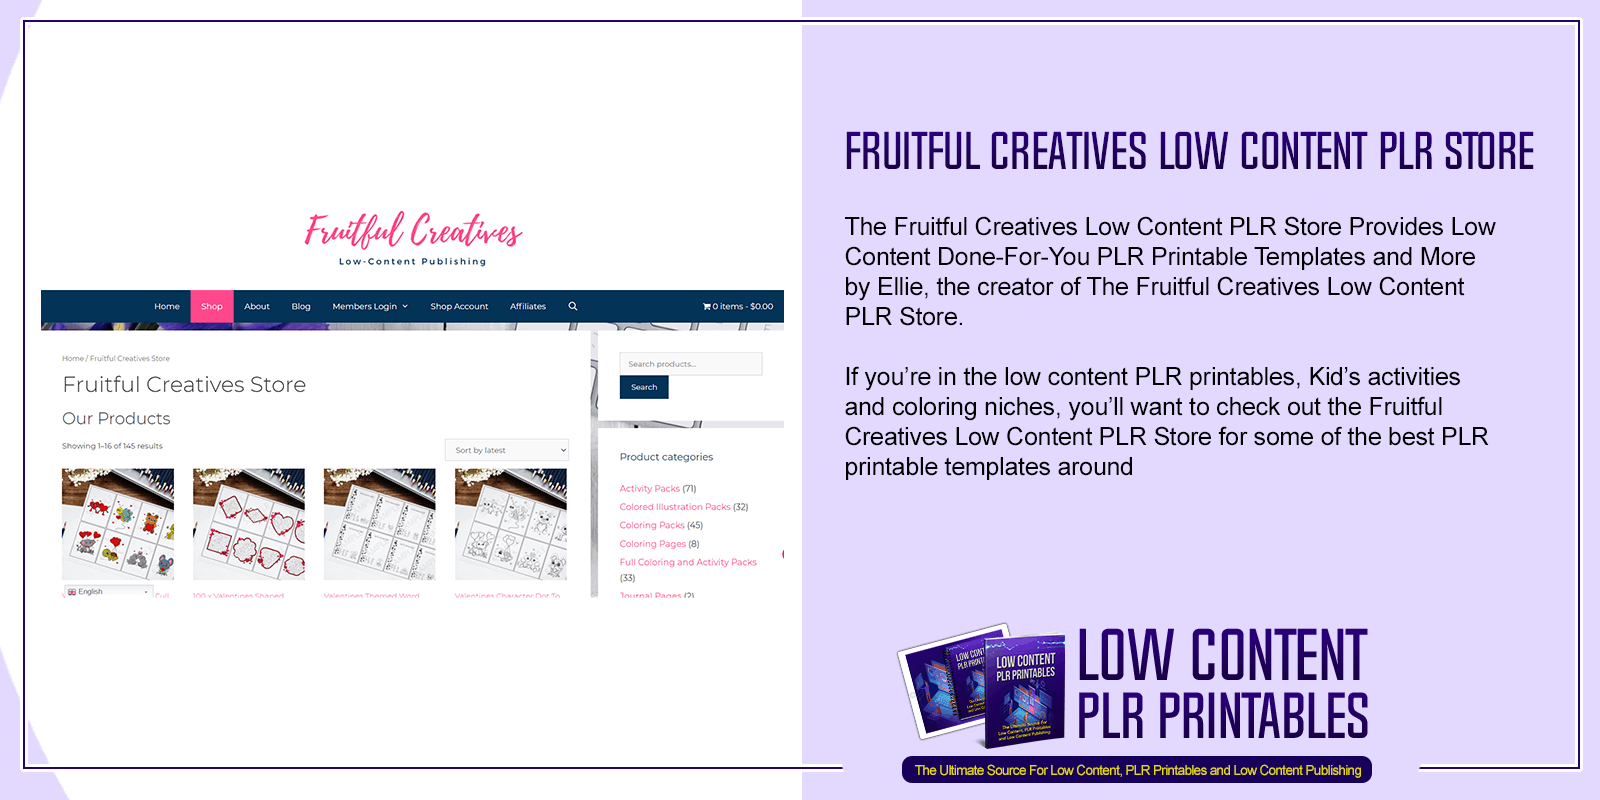 Fruitful Creatives Low Content PLR Store